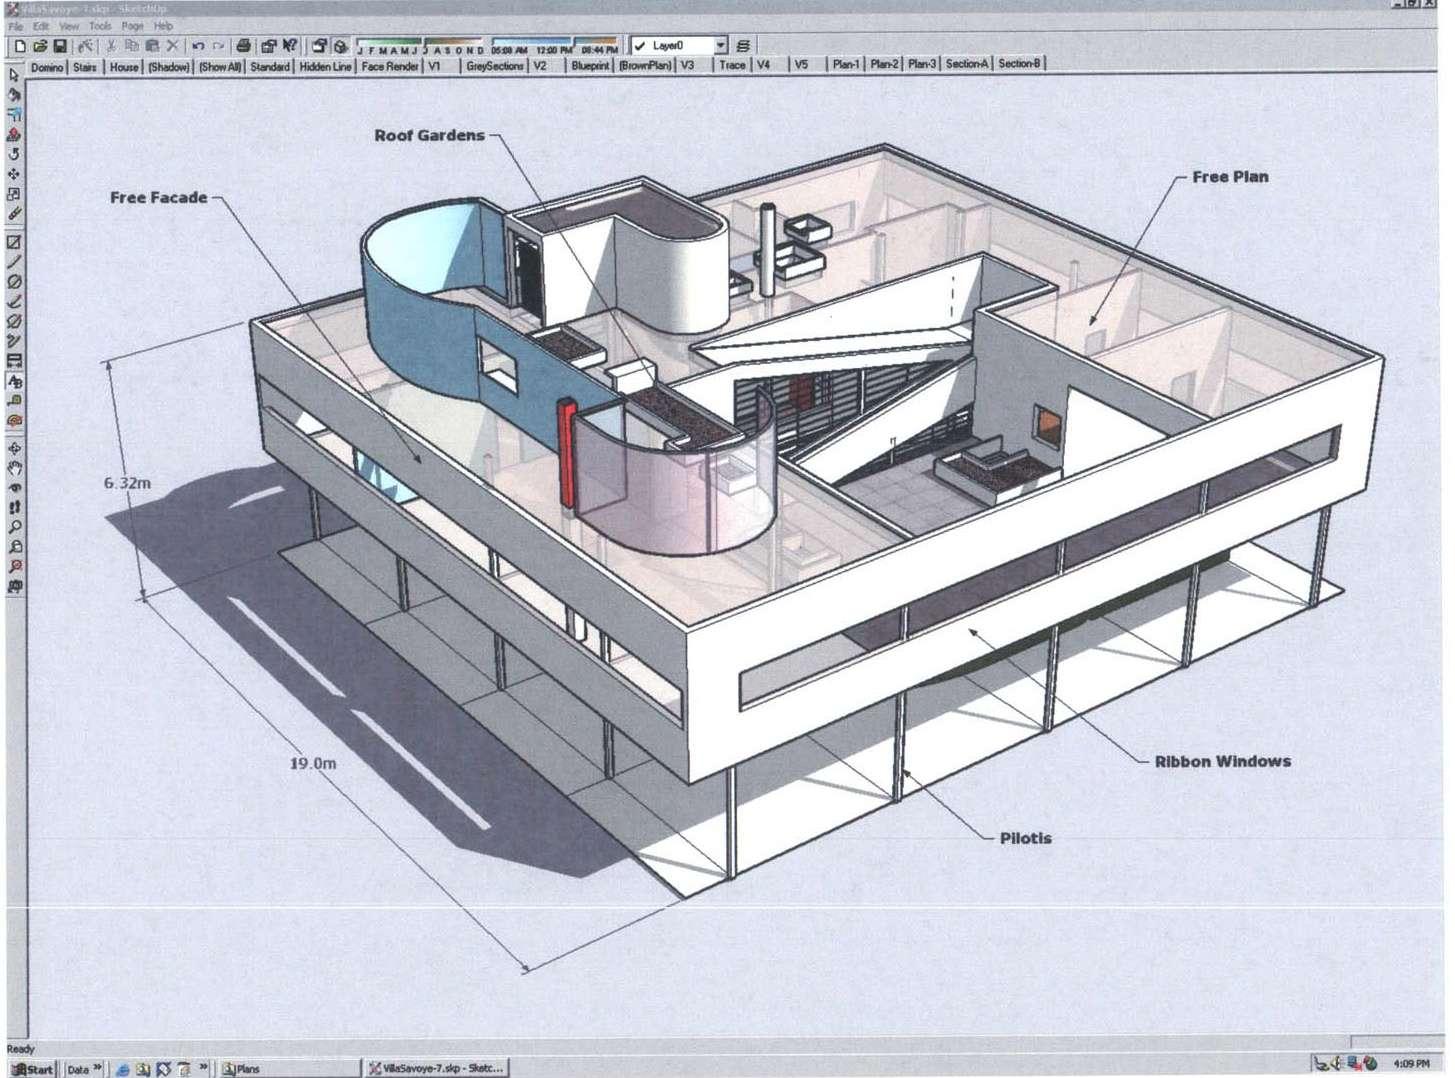 DataLife Engine Версия для печати дизайн квартиры google sketchup бесплатно